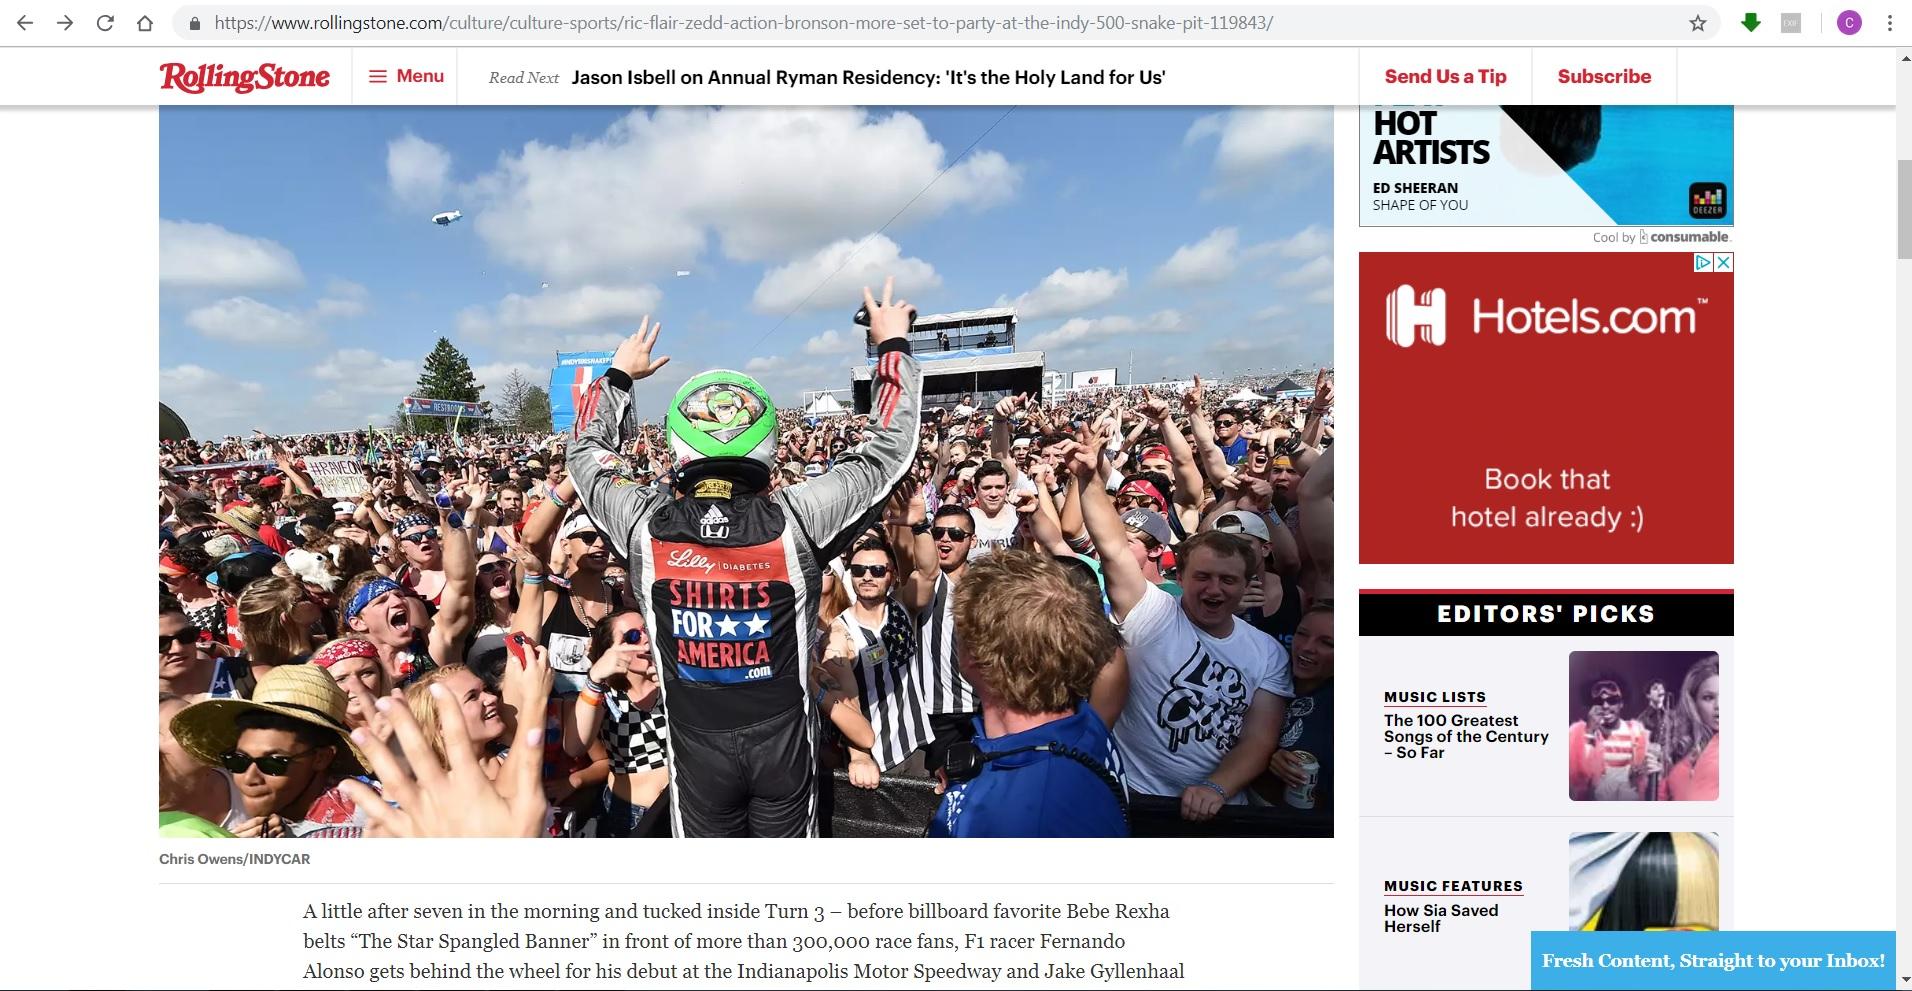 Rolling Stone Magazine - Indy 500